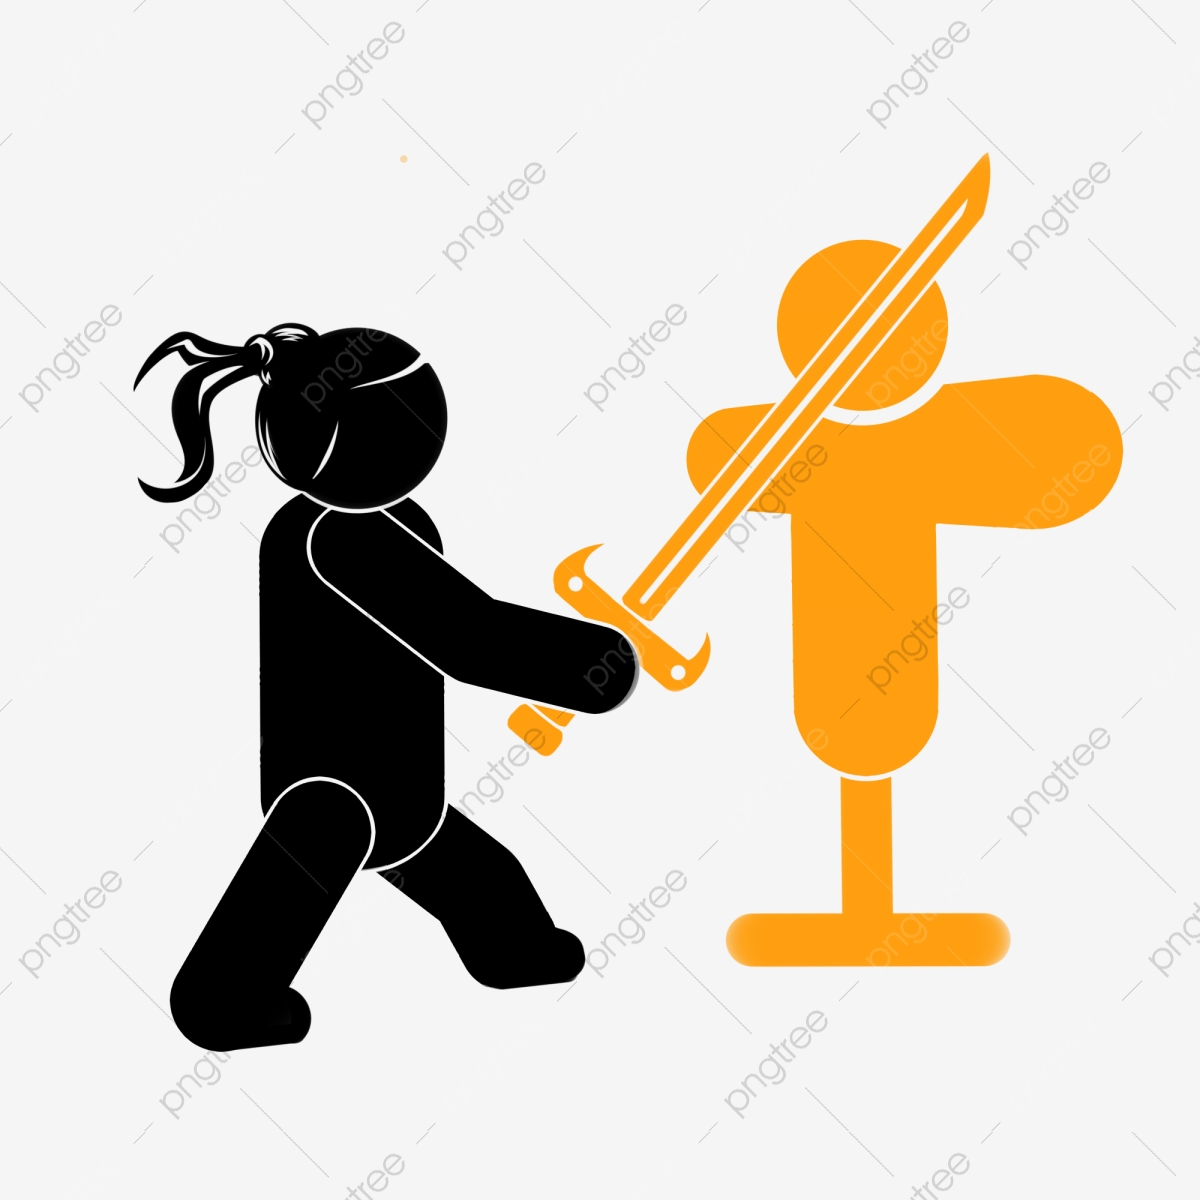 Stick Figure Running Clip Art - Pivot Animator - Stickman Cliparts  Transparent PNG